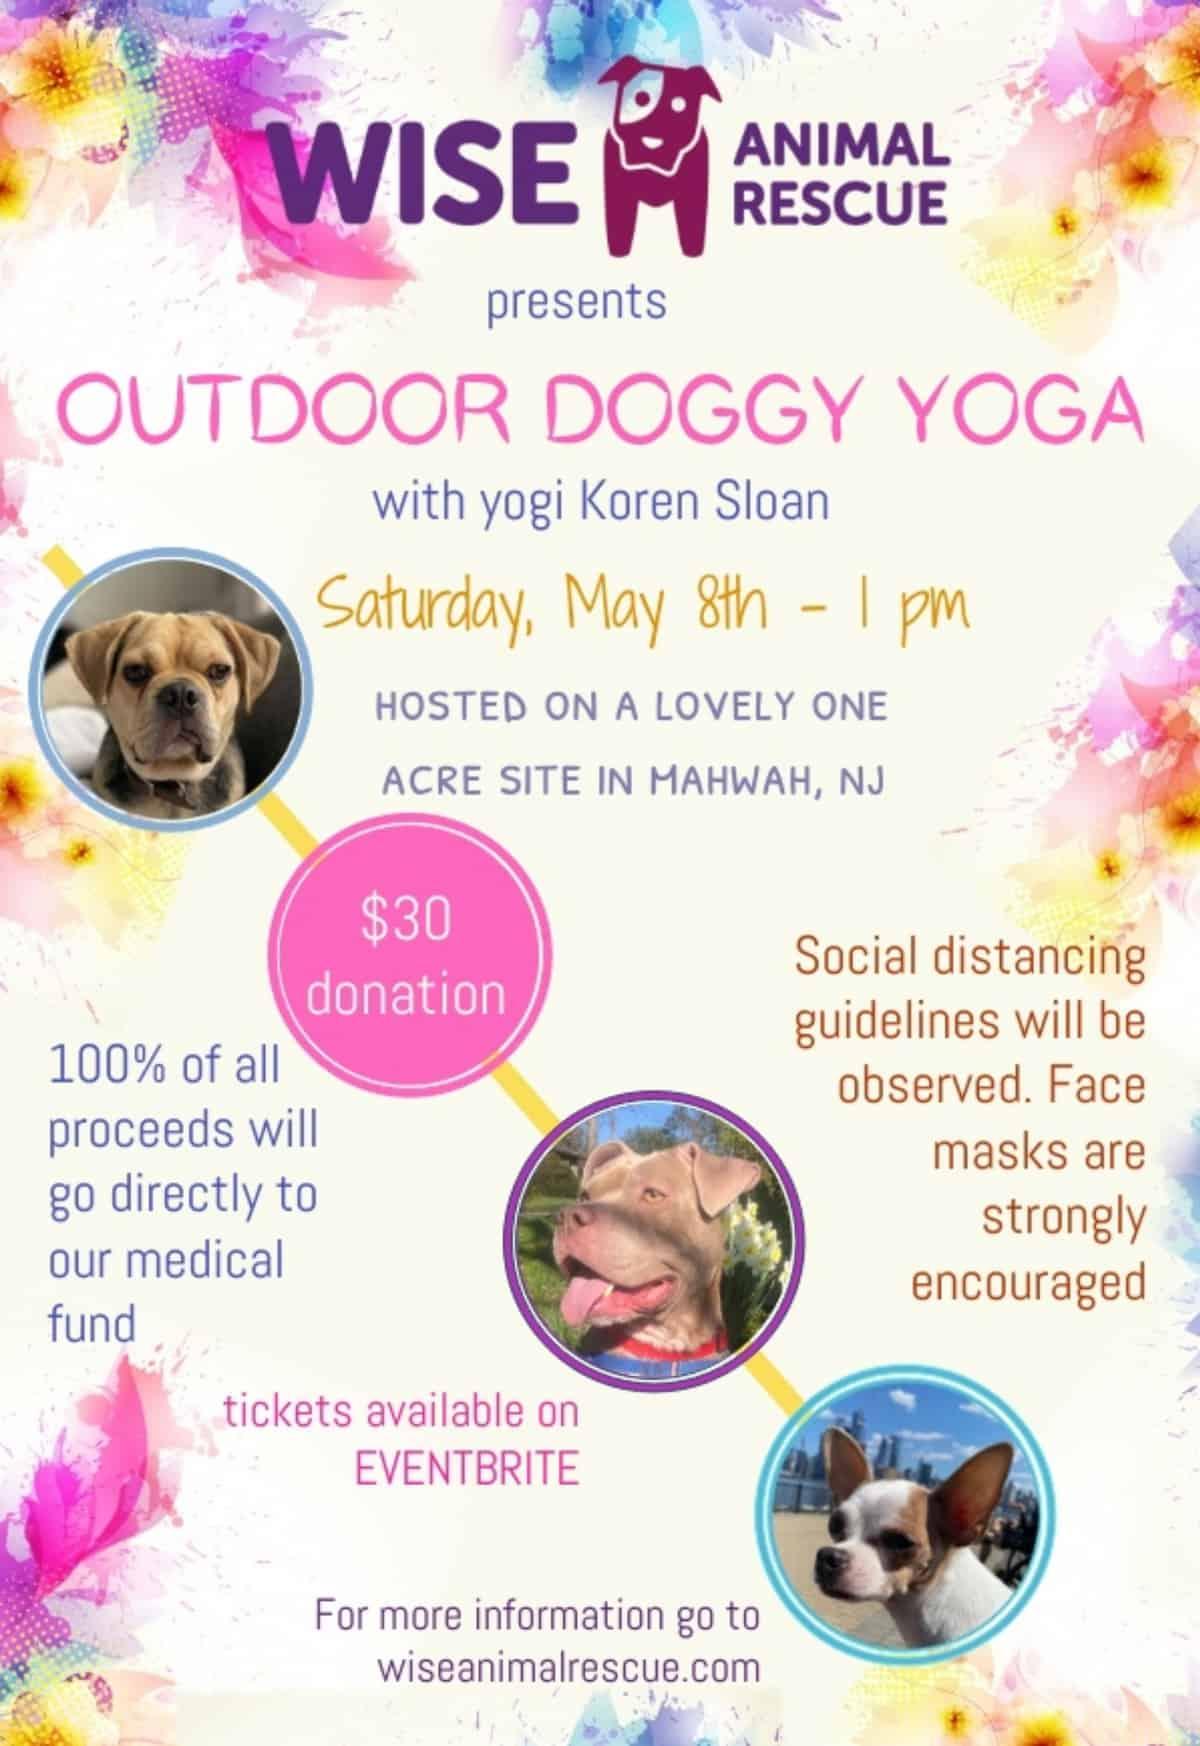 Outdoor Doggie Yoga WISE Fundraiser